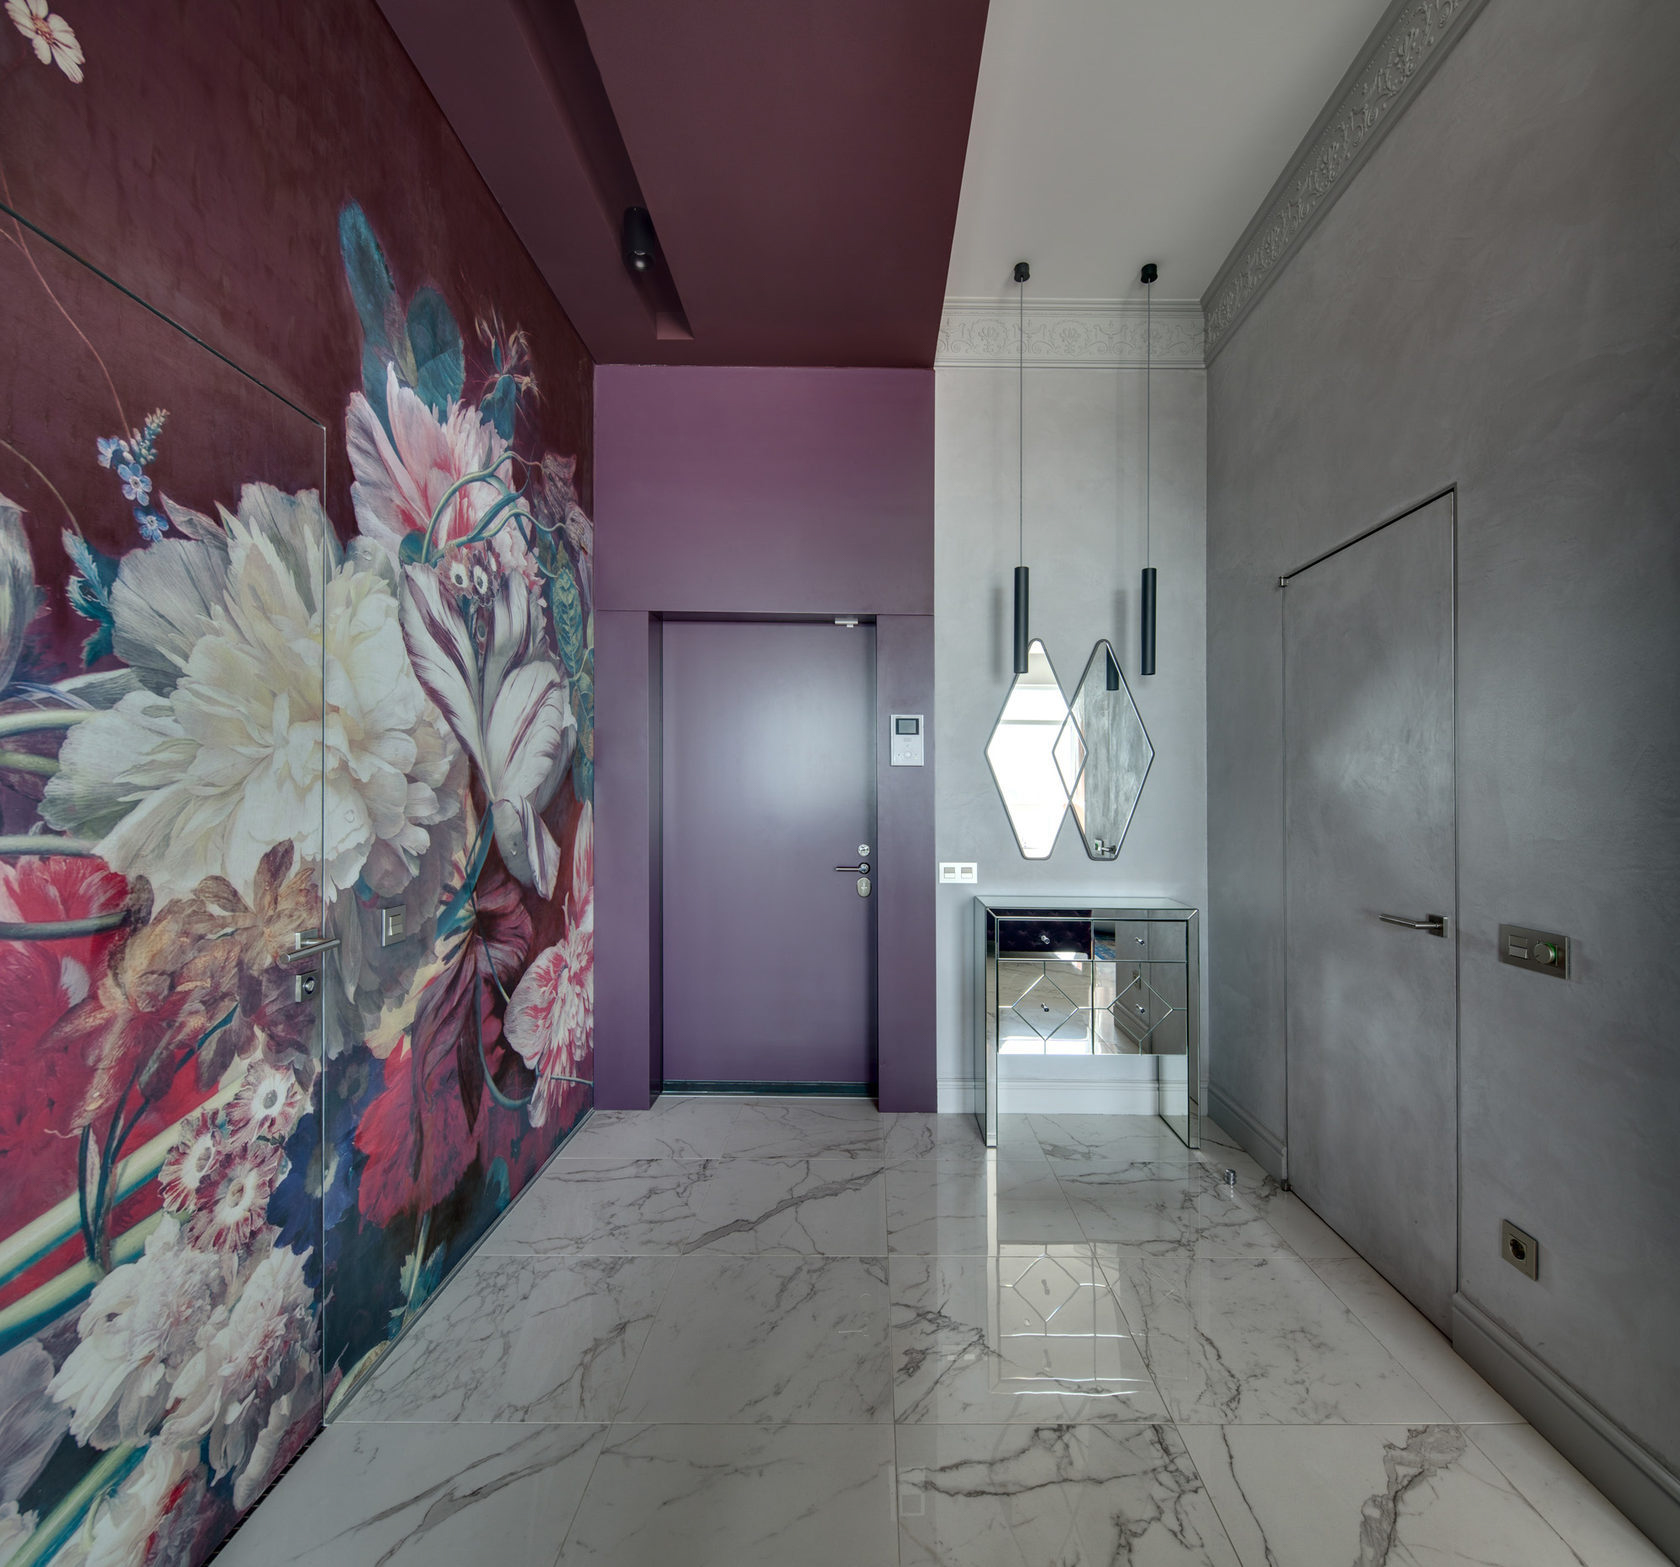 Blossom Apartment Interior Design Kiev, Ukraine – Nika Vorotyntseva